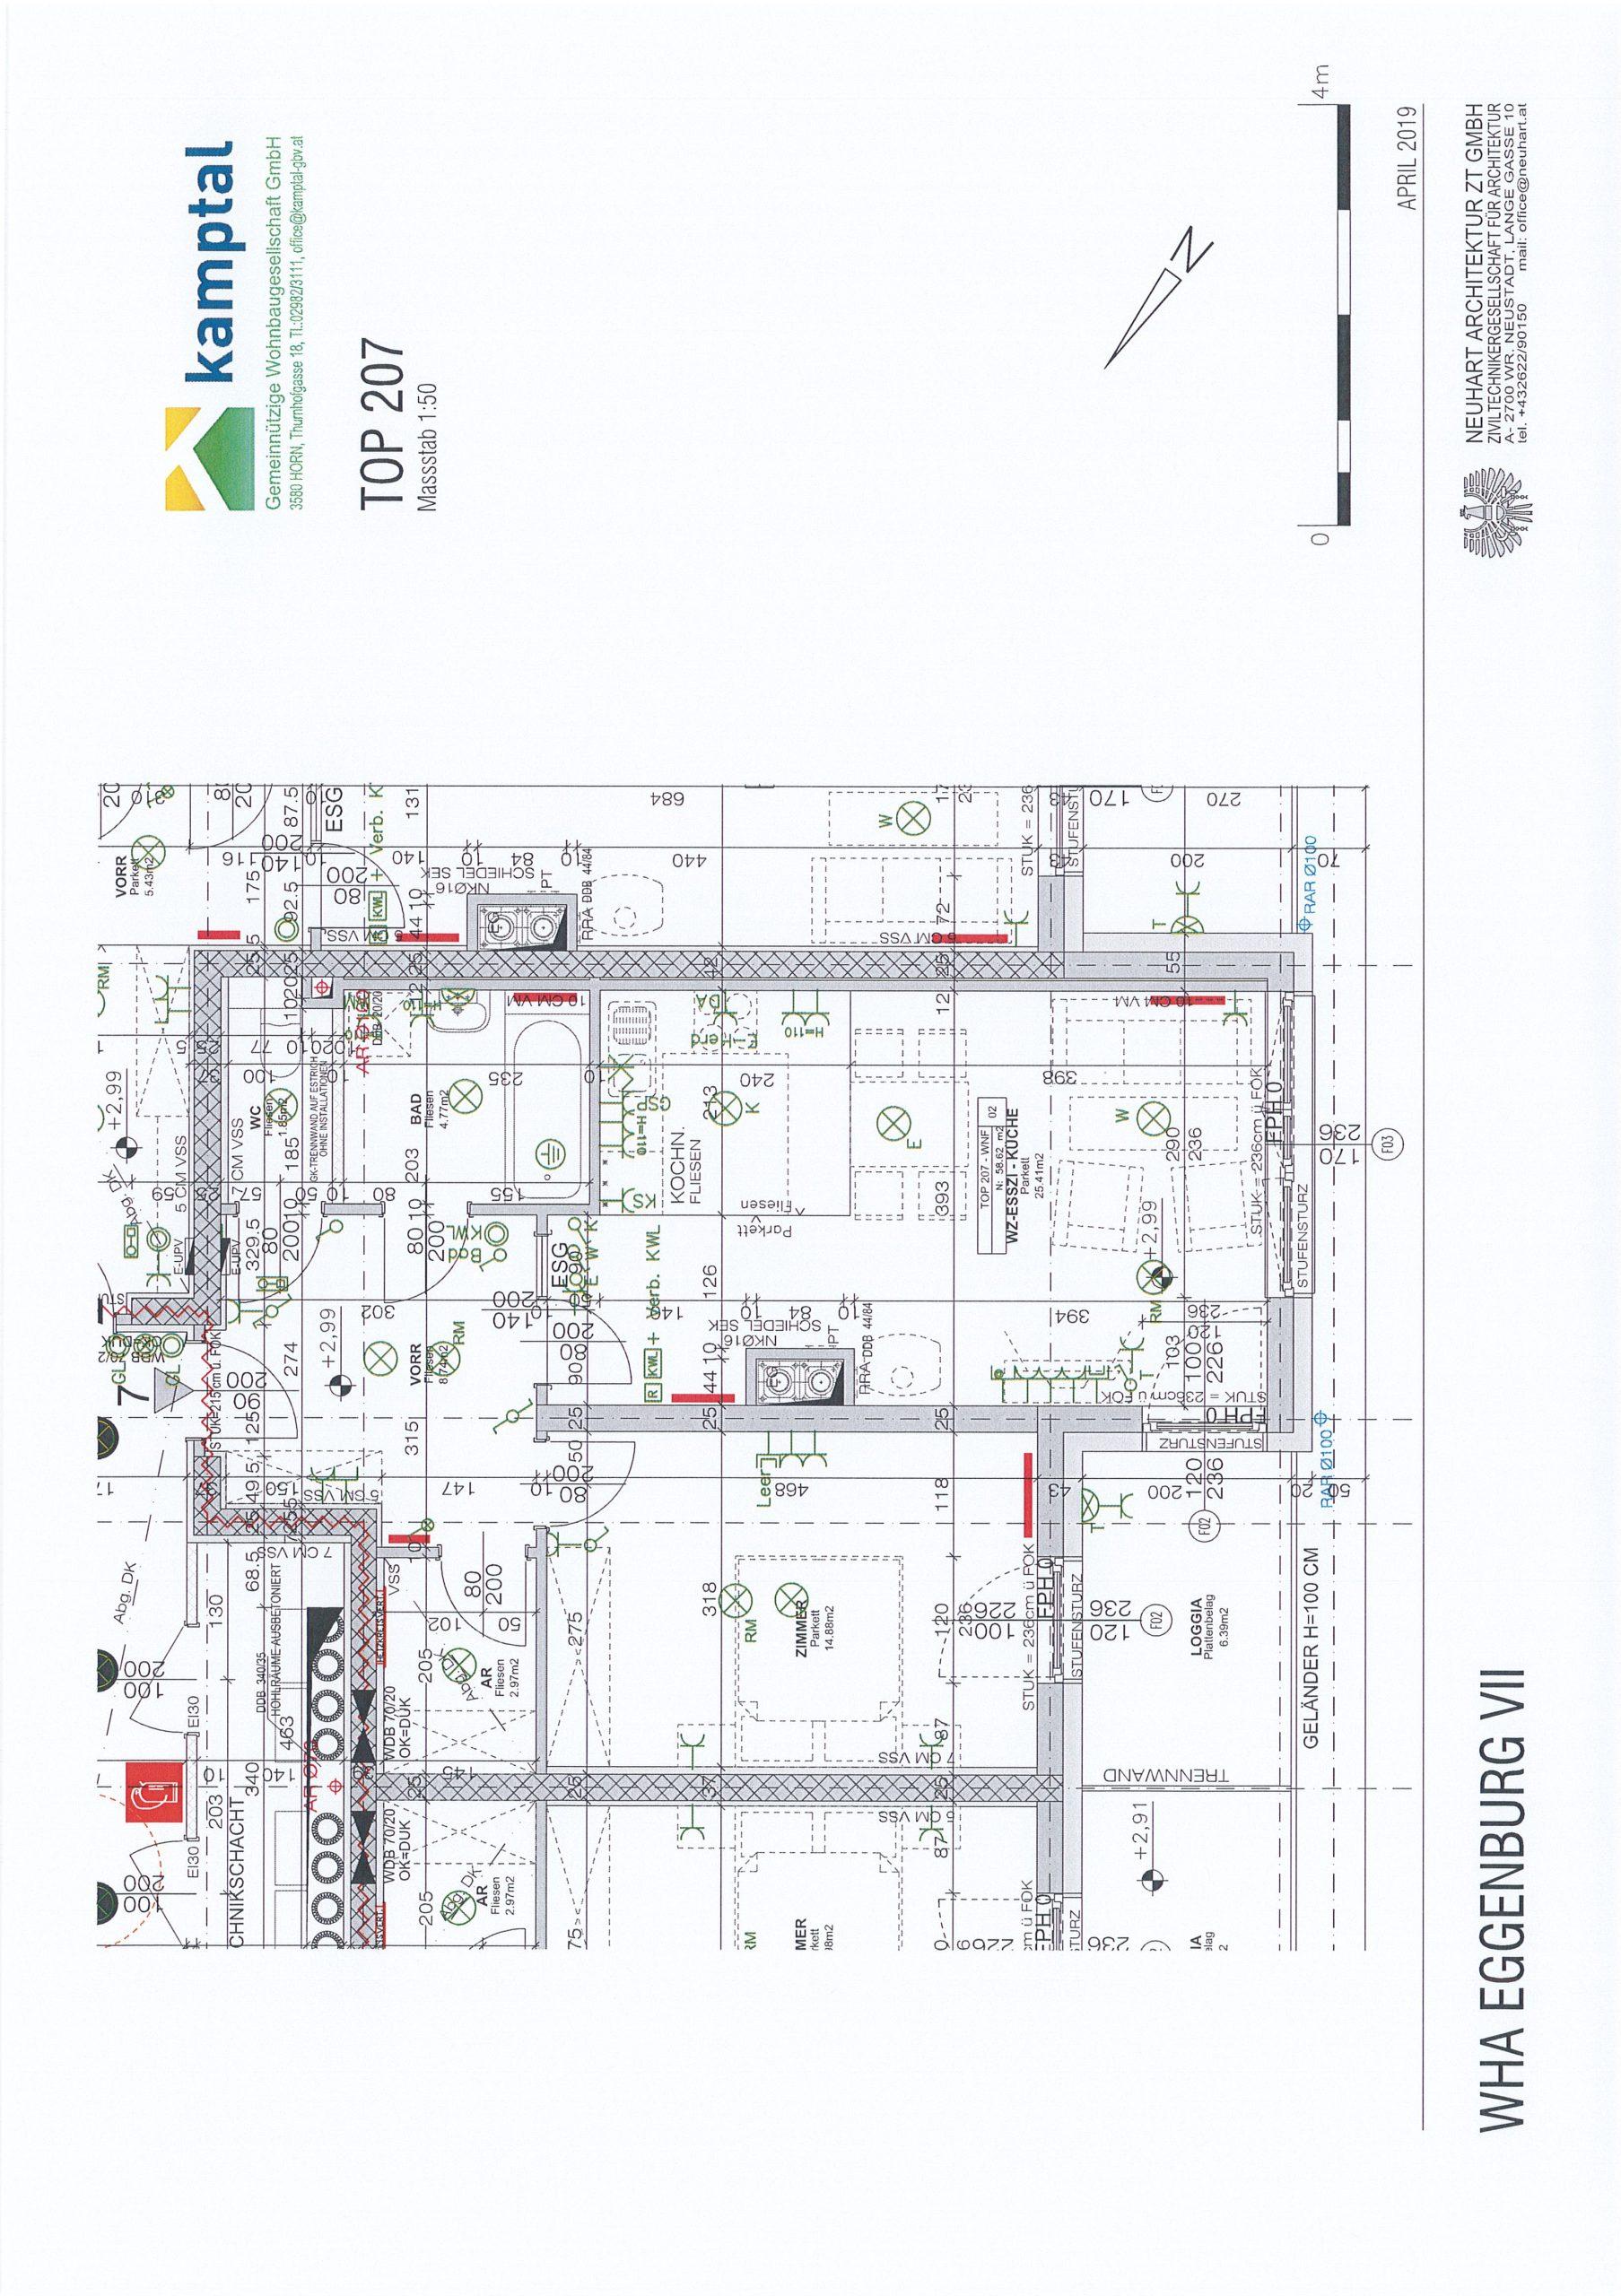 Immobilie von Kamptal in 3730 Eggenburg, Horn, Eggenburg VII - Top 207 #10